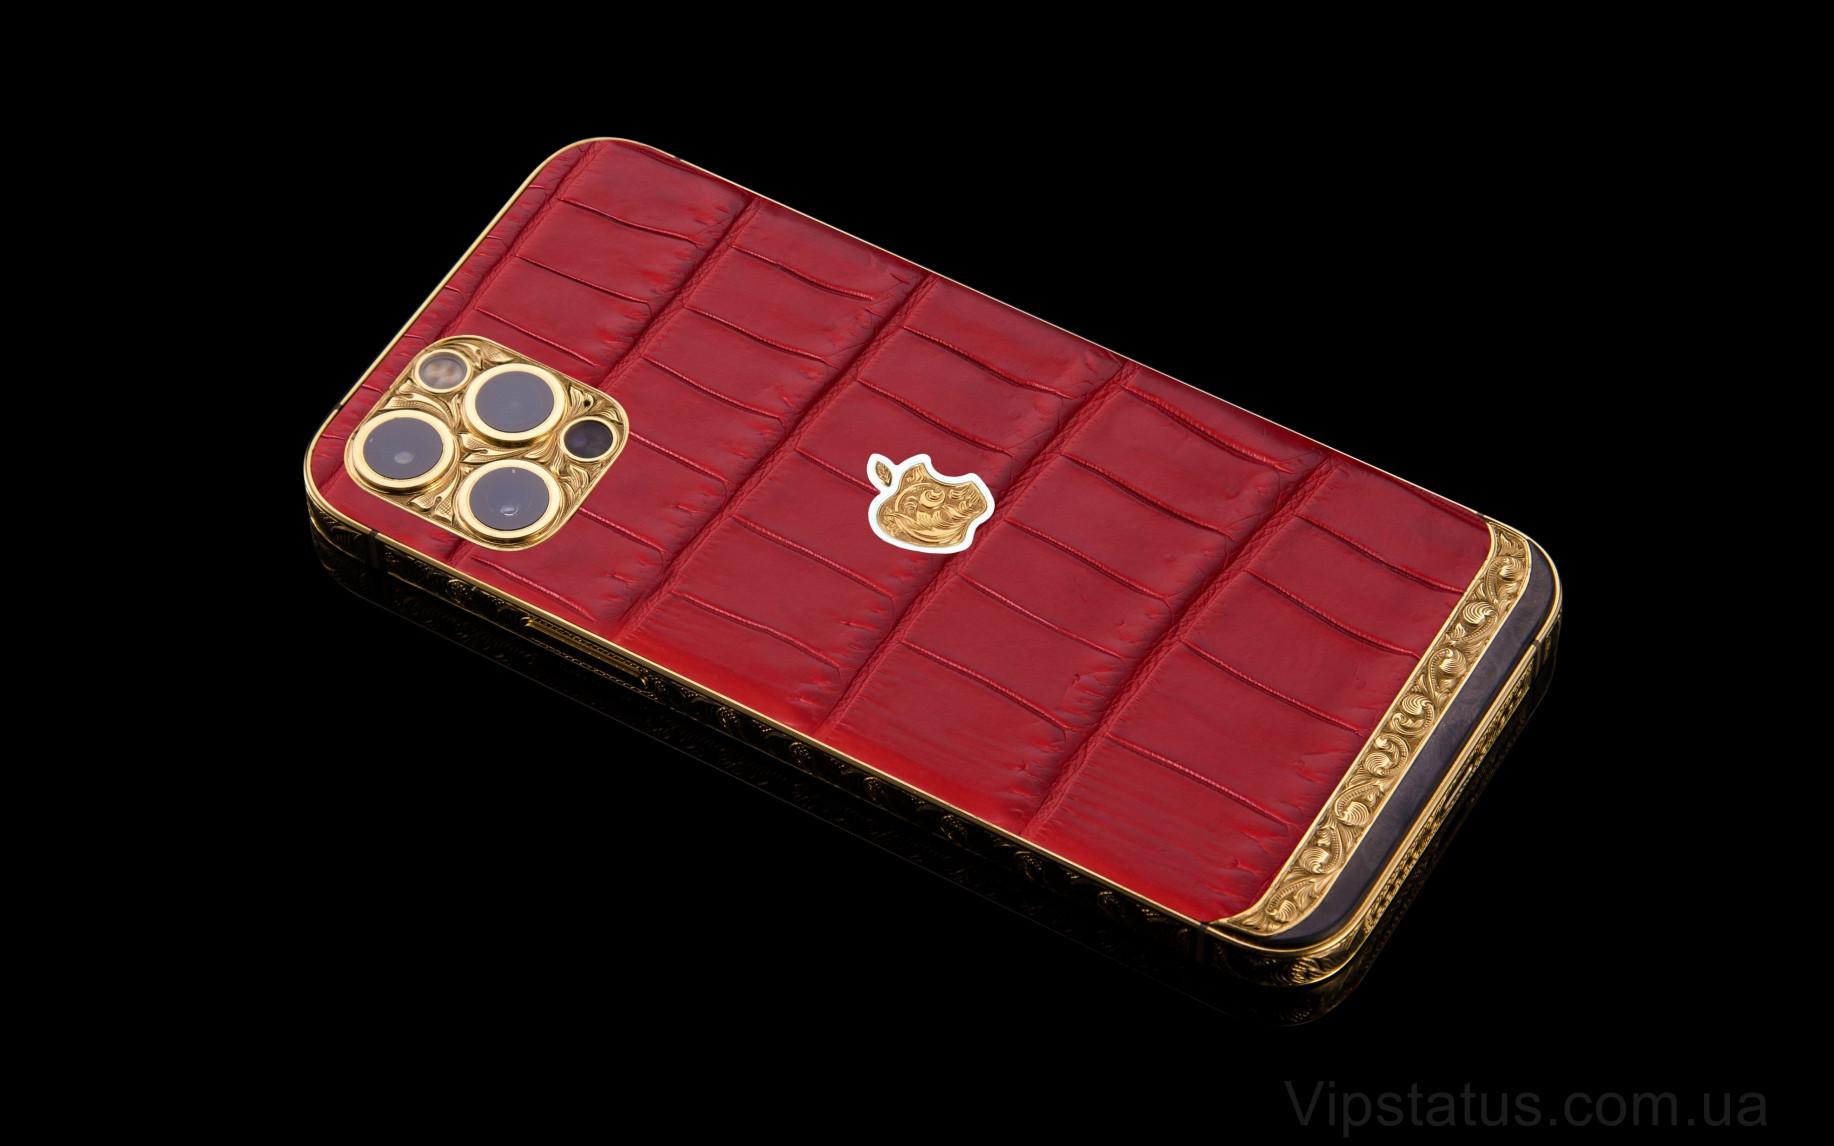 Elite Red Queen IPHONE 12 PRO MAX 512 GB Red Queen IPHONE 12 PRO MAX 512 GB image 3